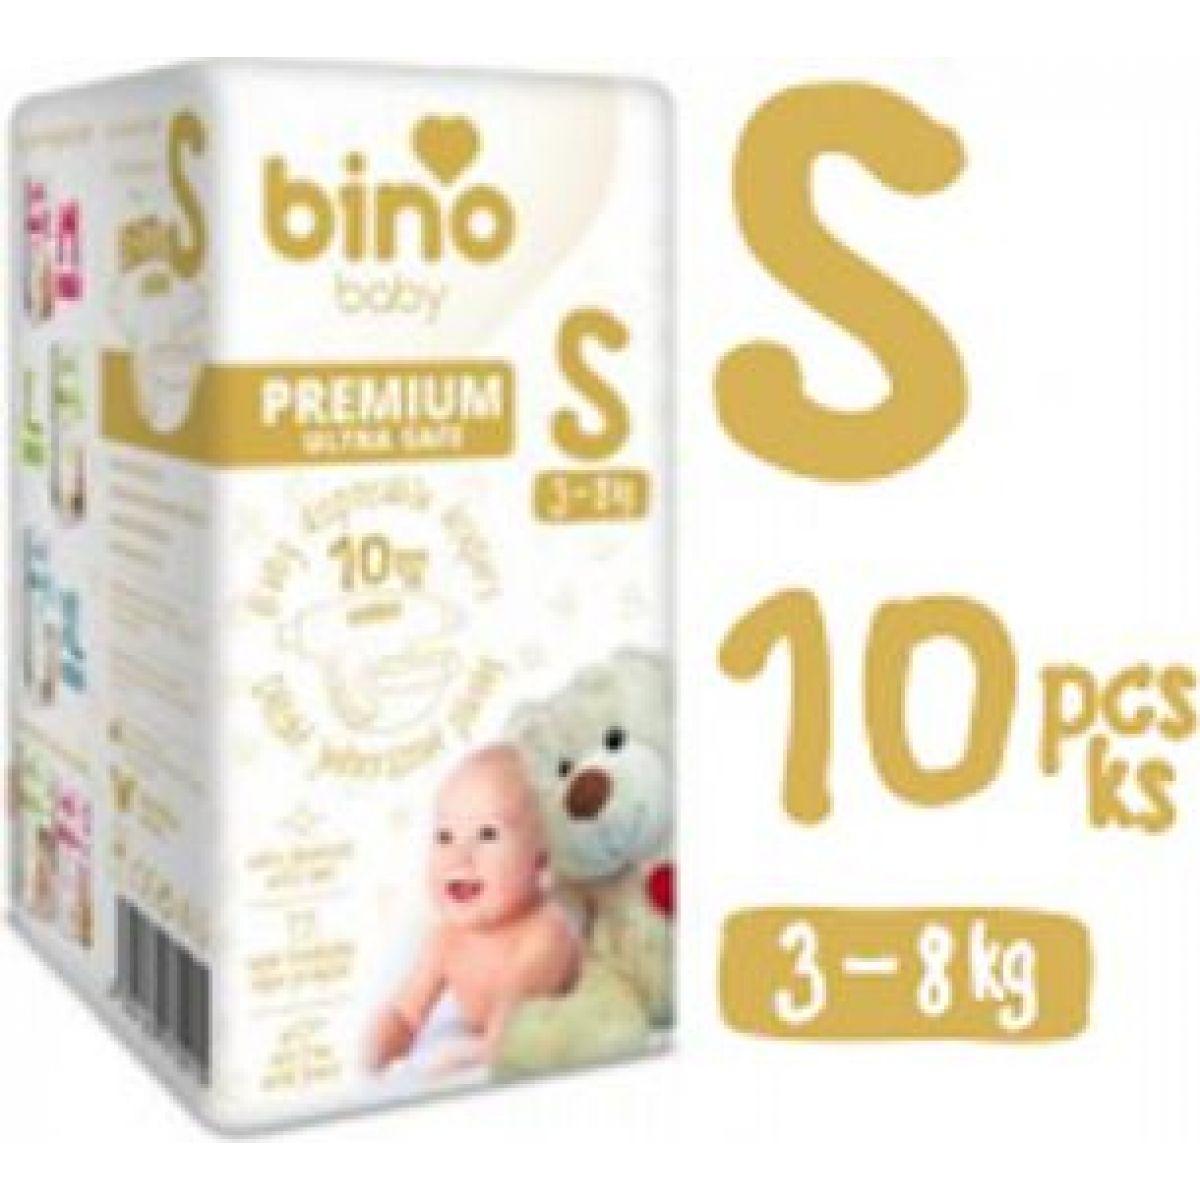 Bino Baby Premium Pleny vel. S 3-8 kg 6 x 10 ks s dárkem